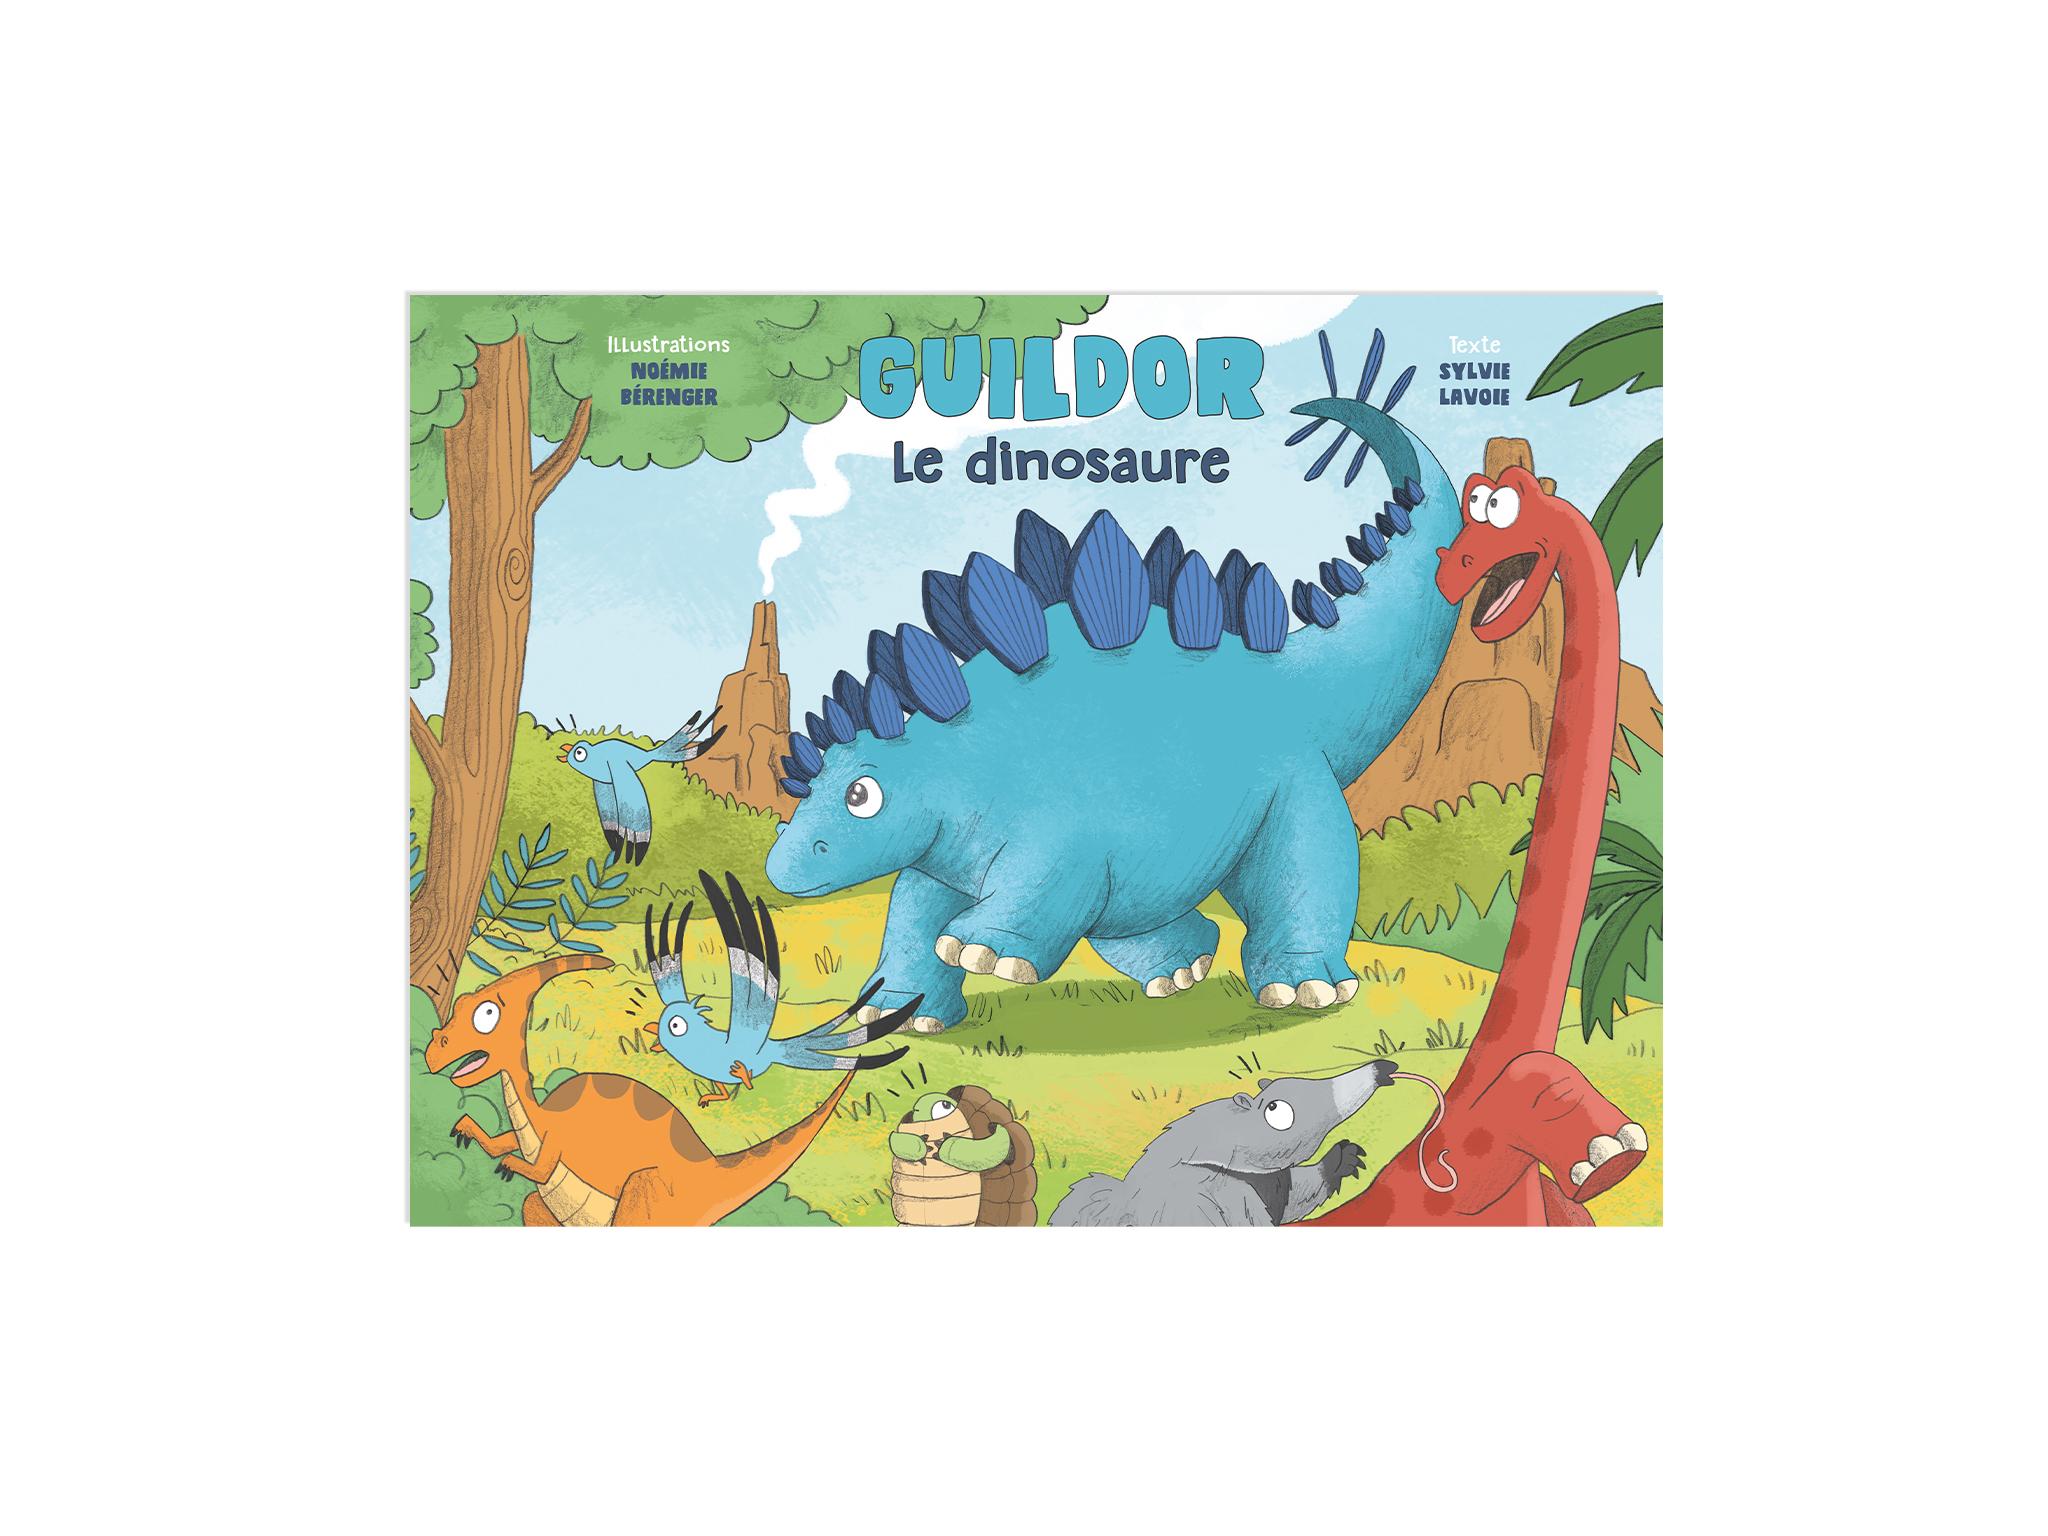 Guildor le dinosaure